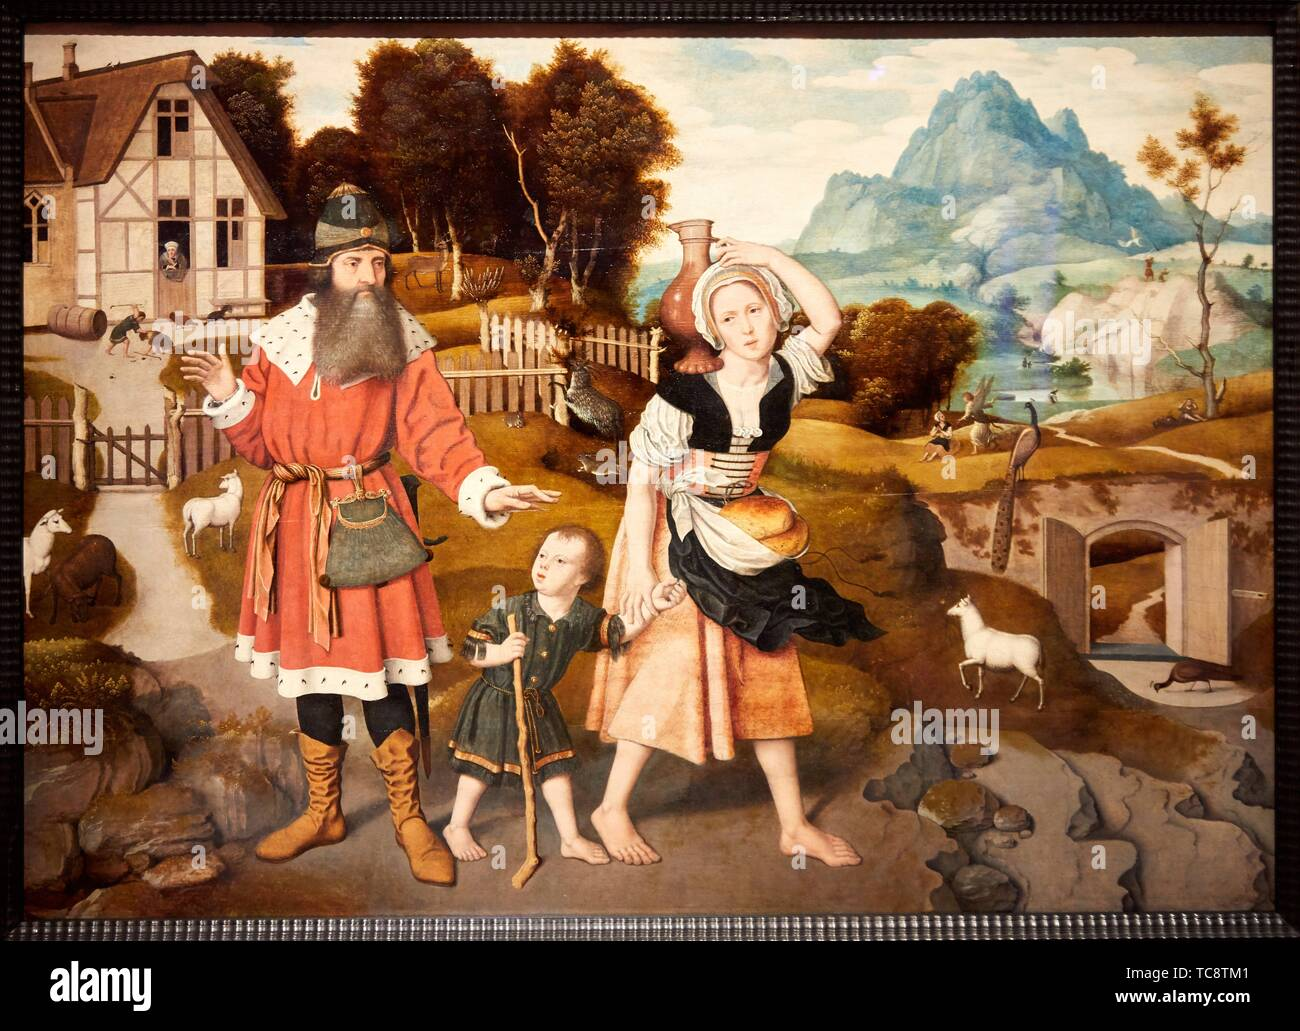 '''The Expulsion of Hagar'', 1520-1525, Jan Mostaert, Thyssen Bornemisza Museum, Madrid, Spain , Europe - Stock Image